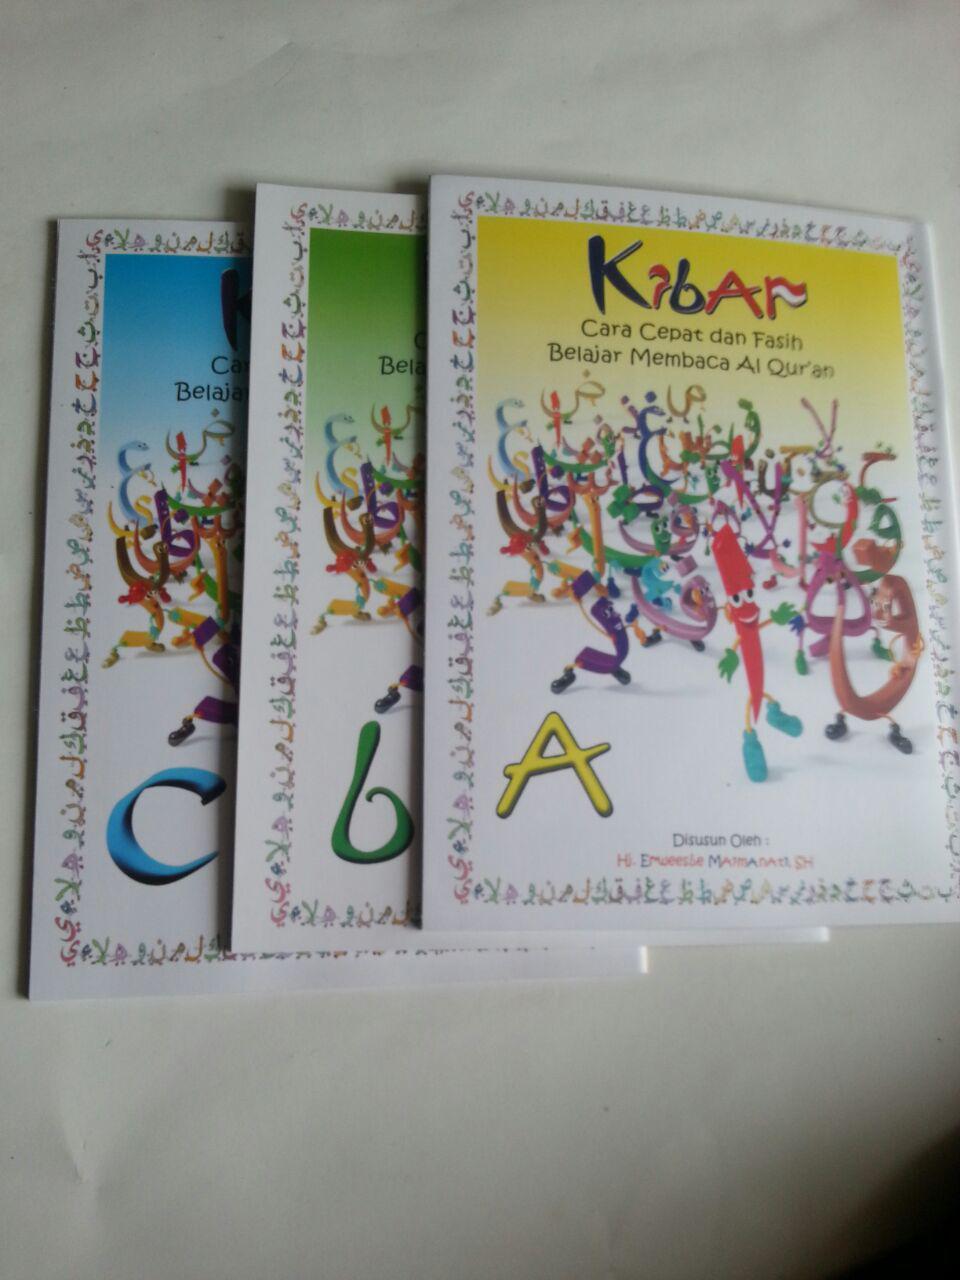 Buku Kibar Cara Cepat Dan Fasih Belajar Membaca Al-Qur'an Full Colour B5 cover 2